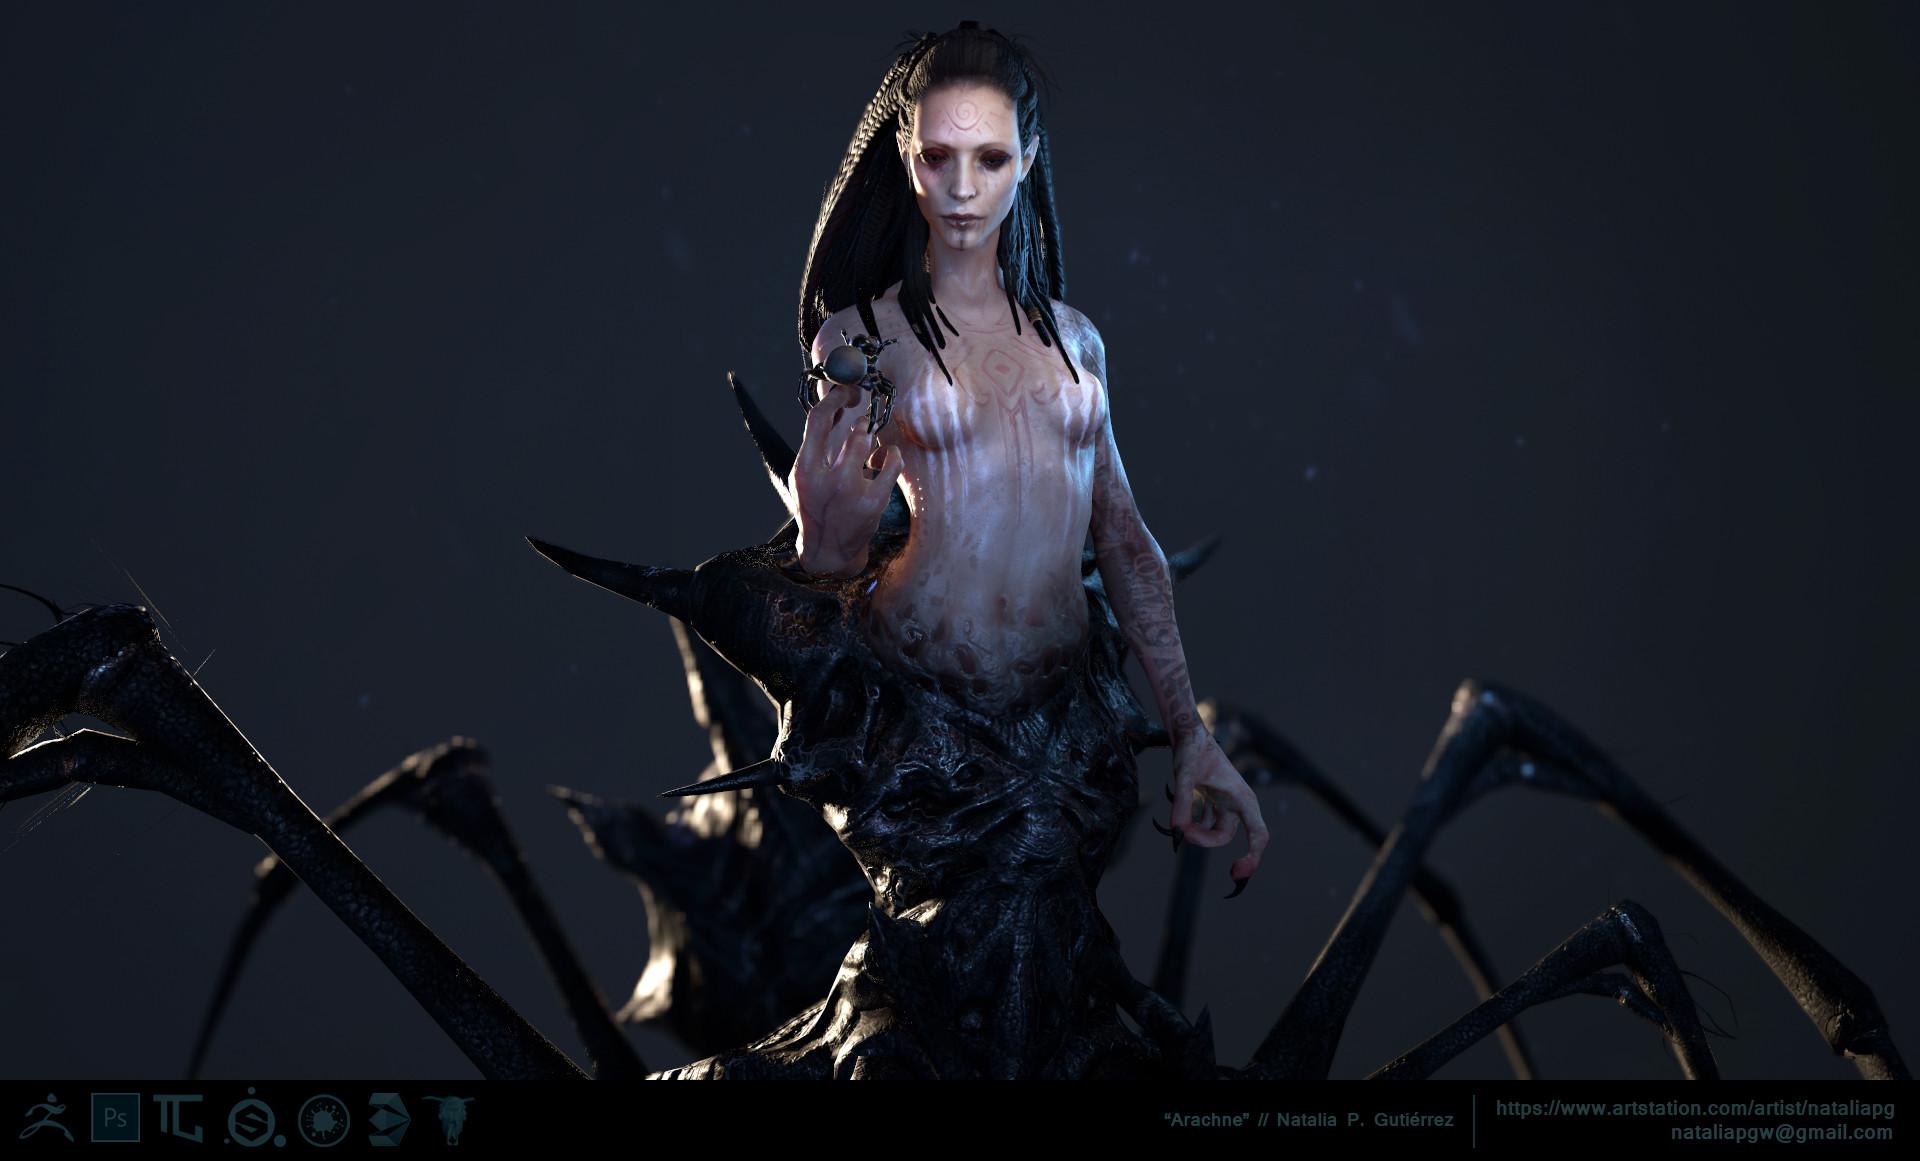 Natalia p gutierrez arachneview 8